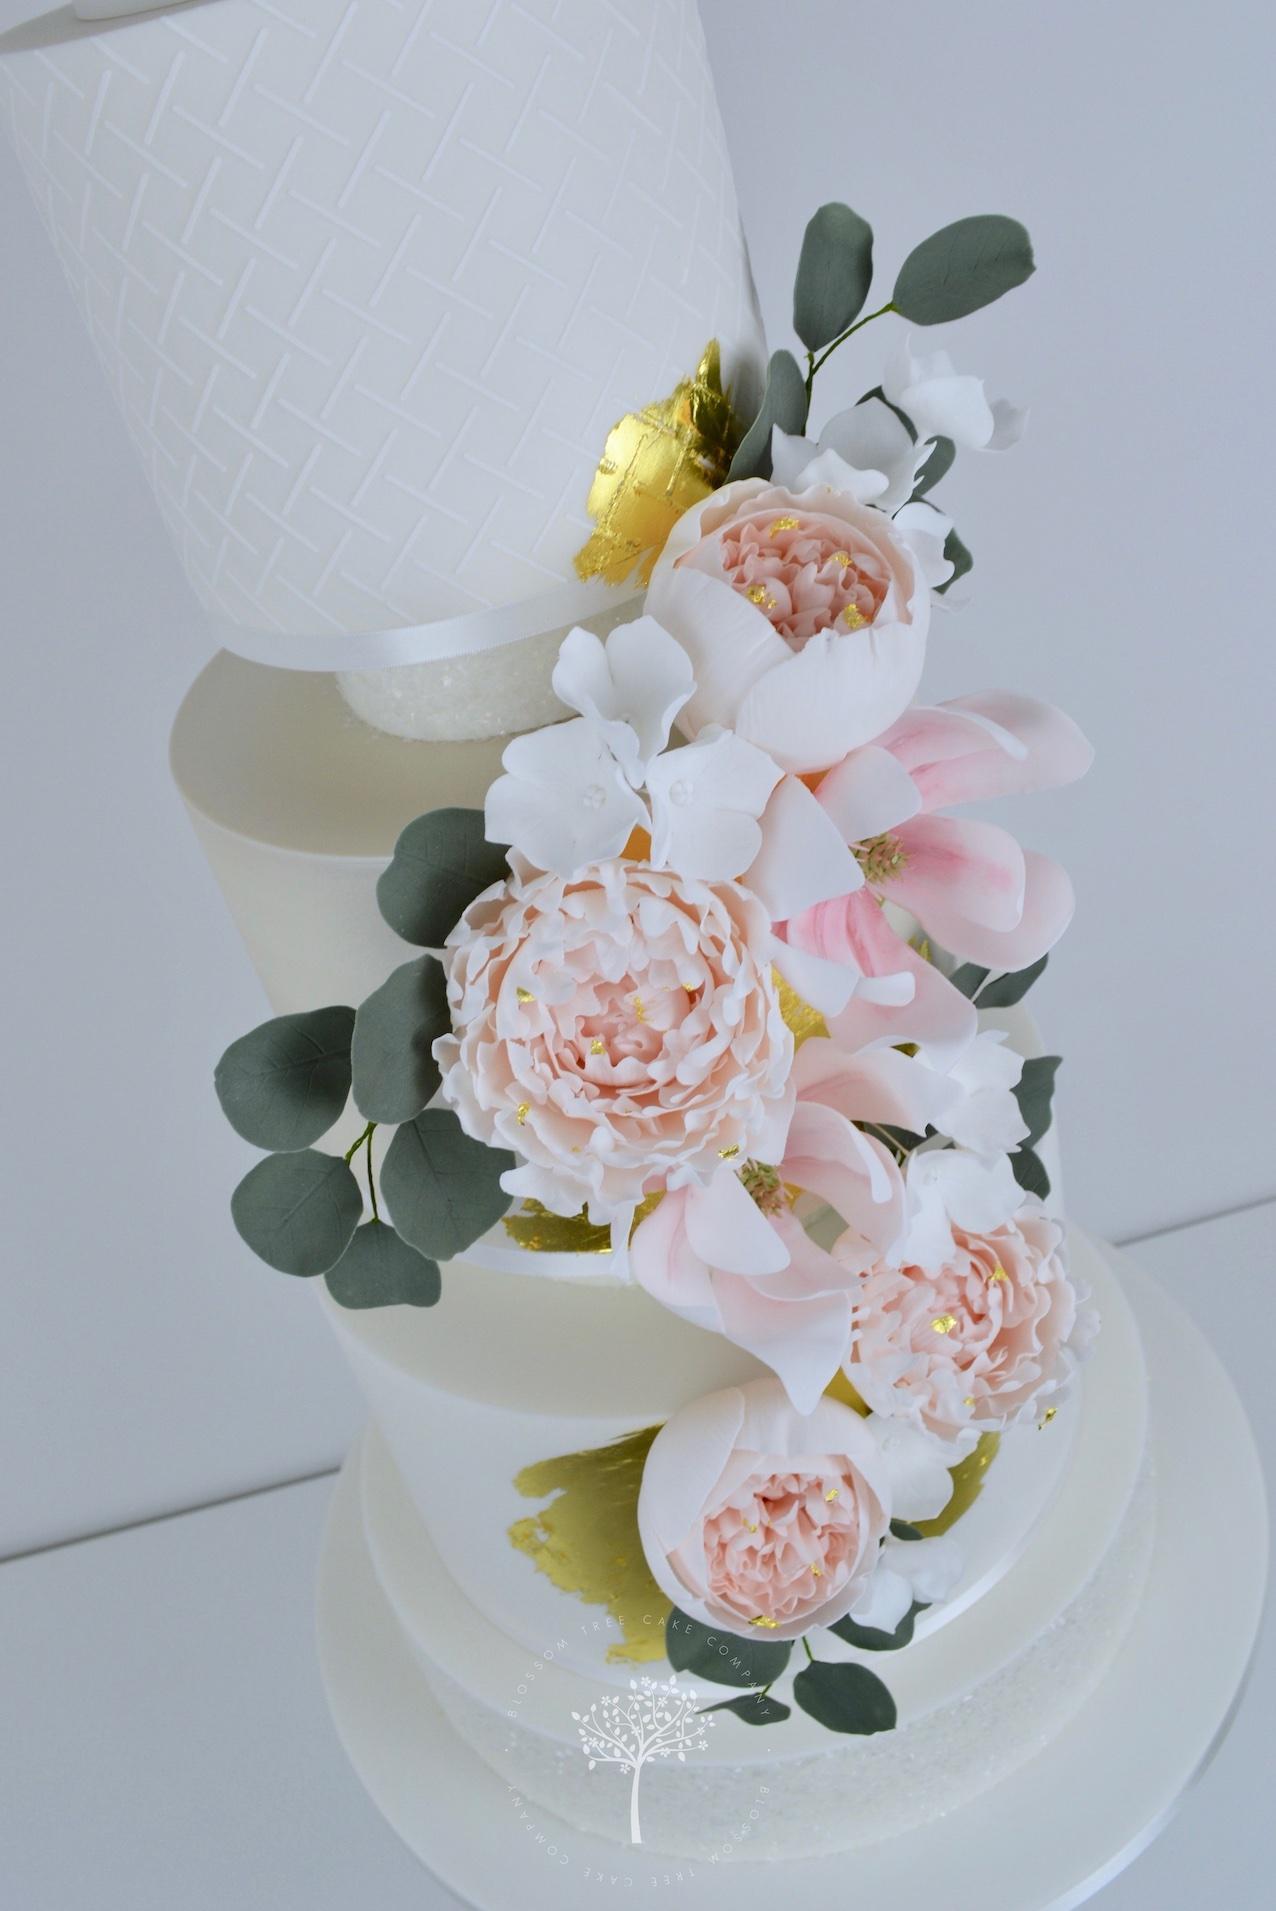 Peony and Magnolia Wedding Cake by Blossom Tree Cake Company Harrogate North Yorkshire - angle.jpg